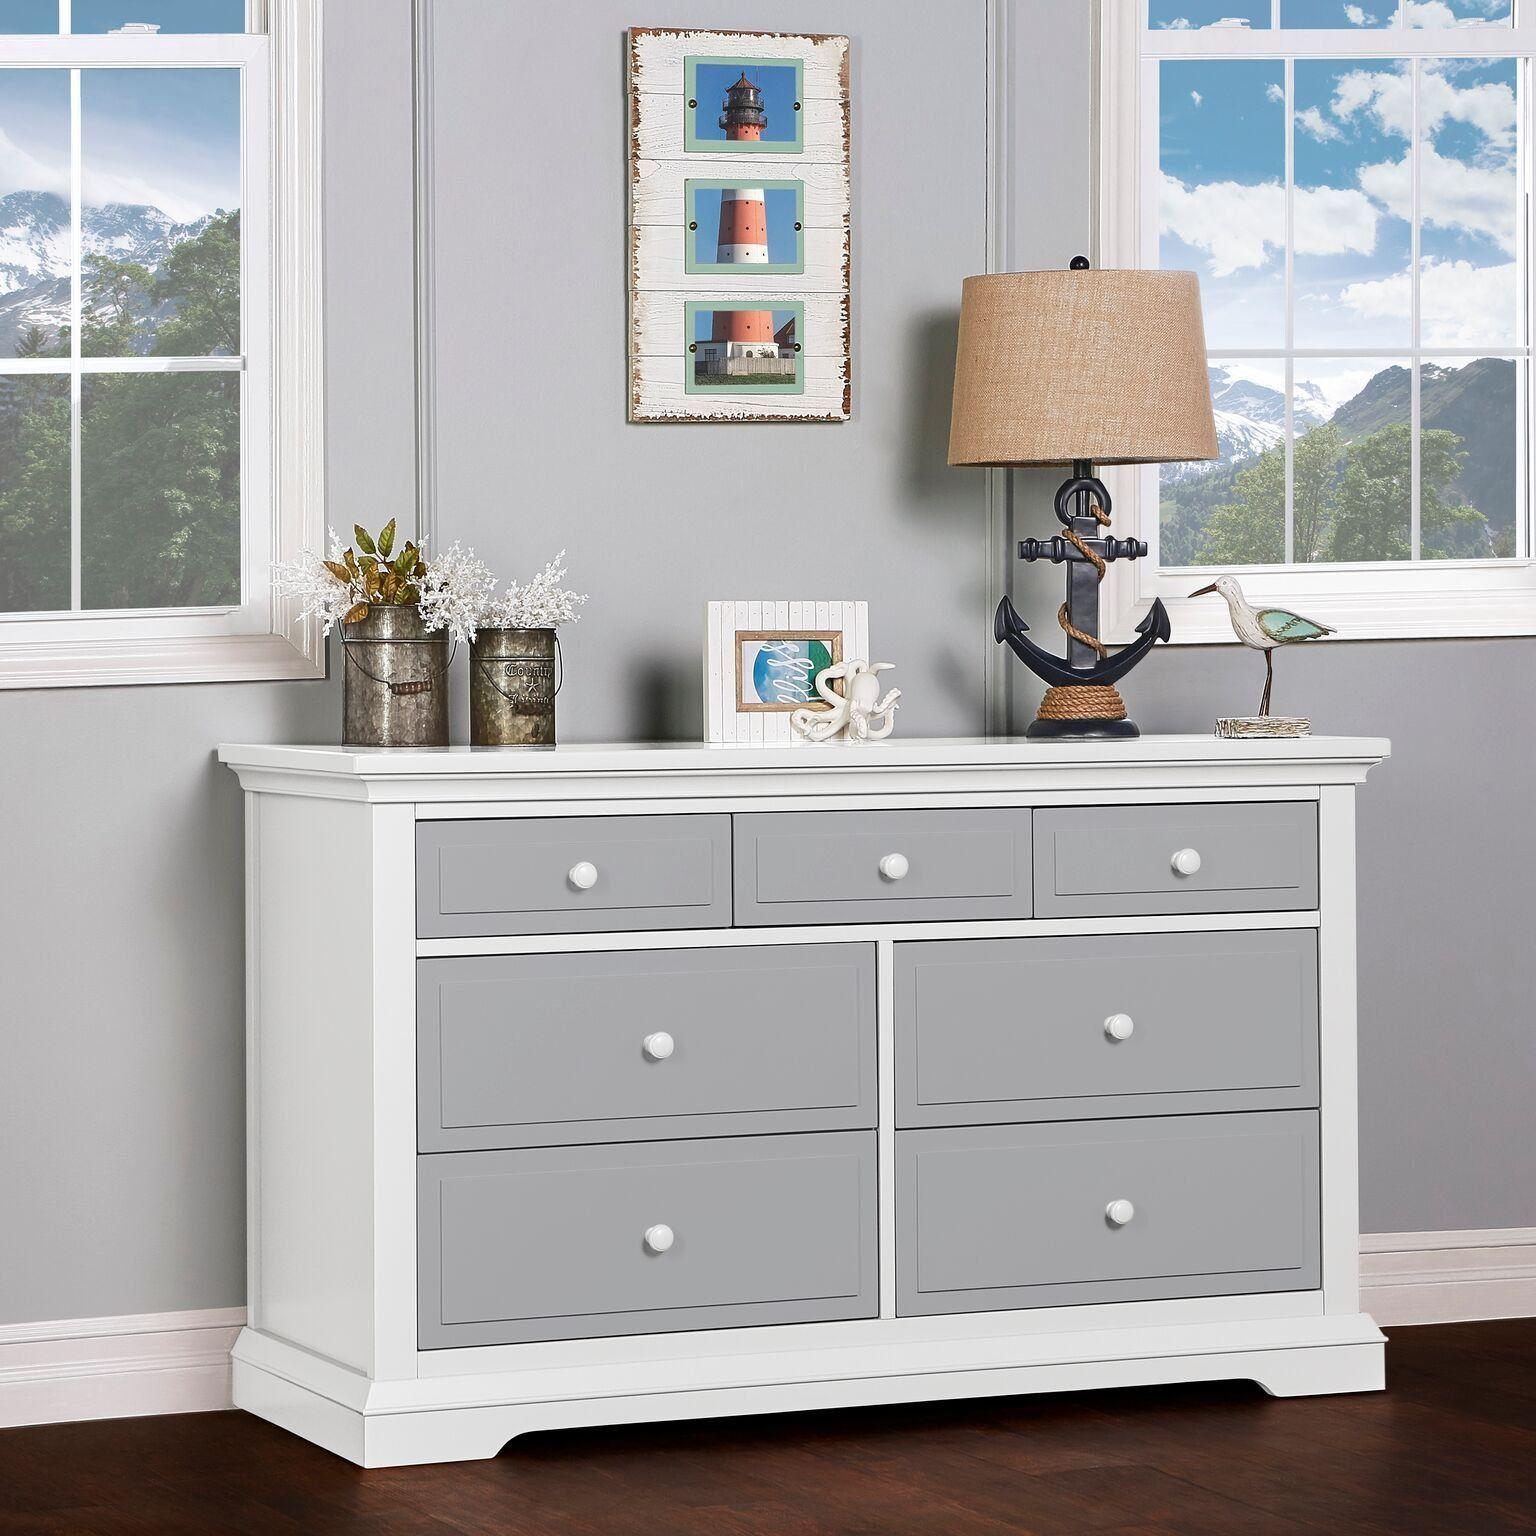 Pin By Tina Solheim On Dresser Re Do Furniture White Dresser Double Dresser [ 1536 x 1536 Pixel ]